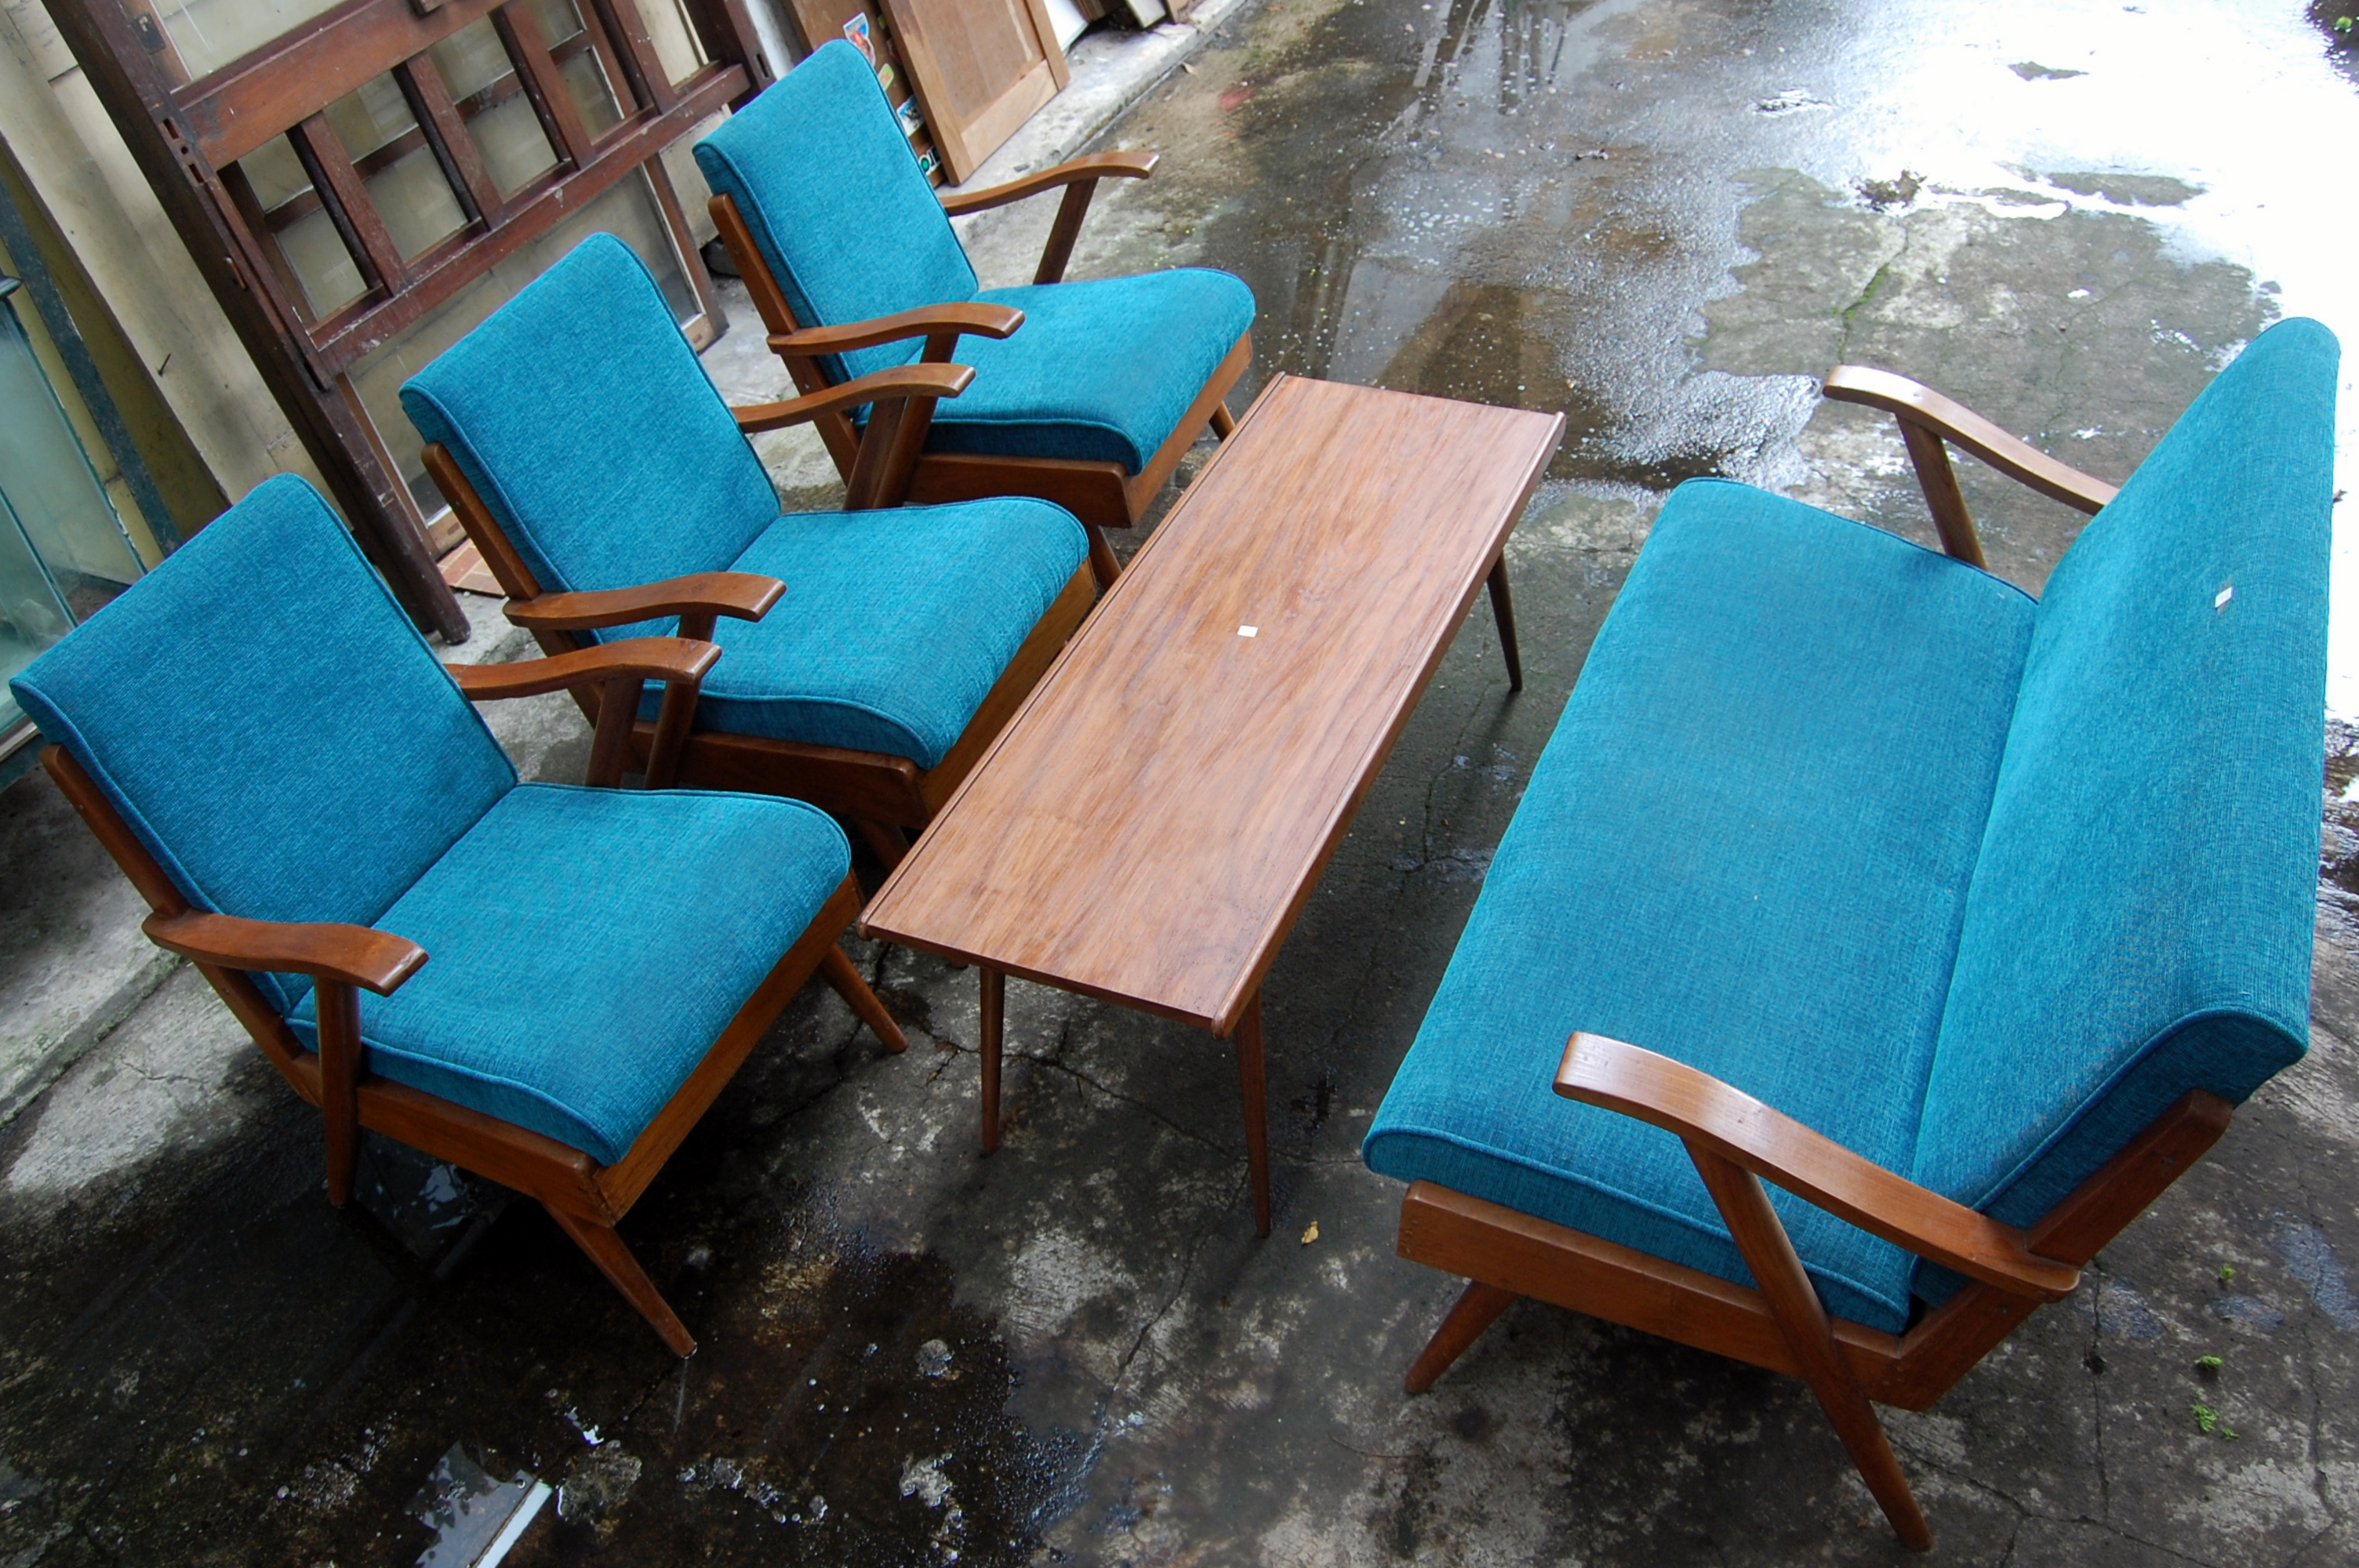 Kursi Jengki Ruang Tamu Biru KJ12BR  Barang Antik